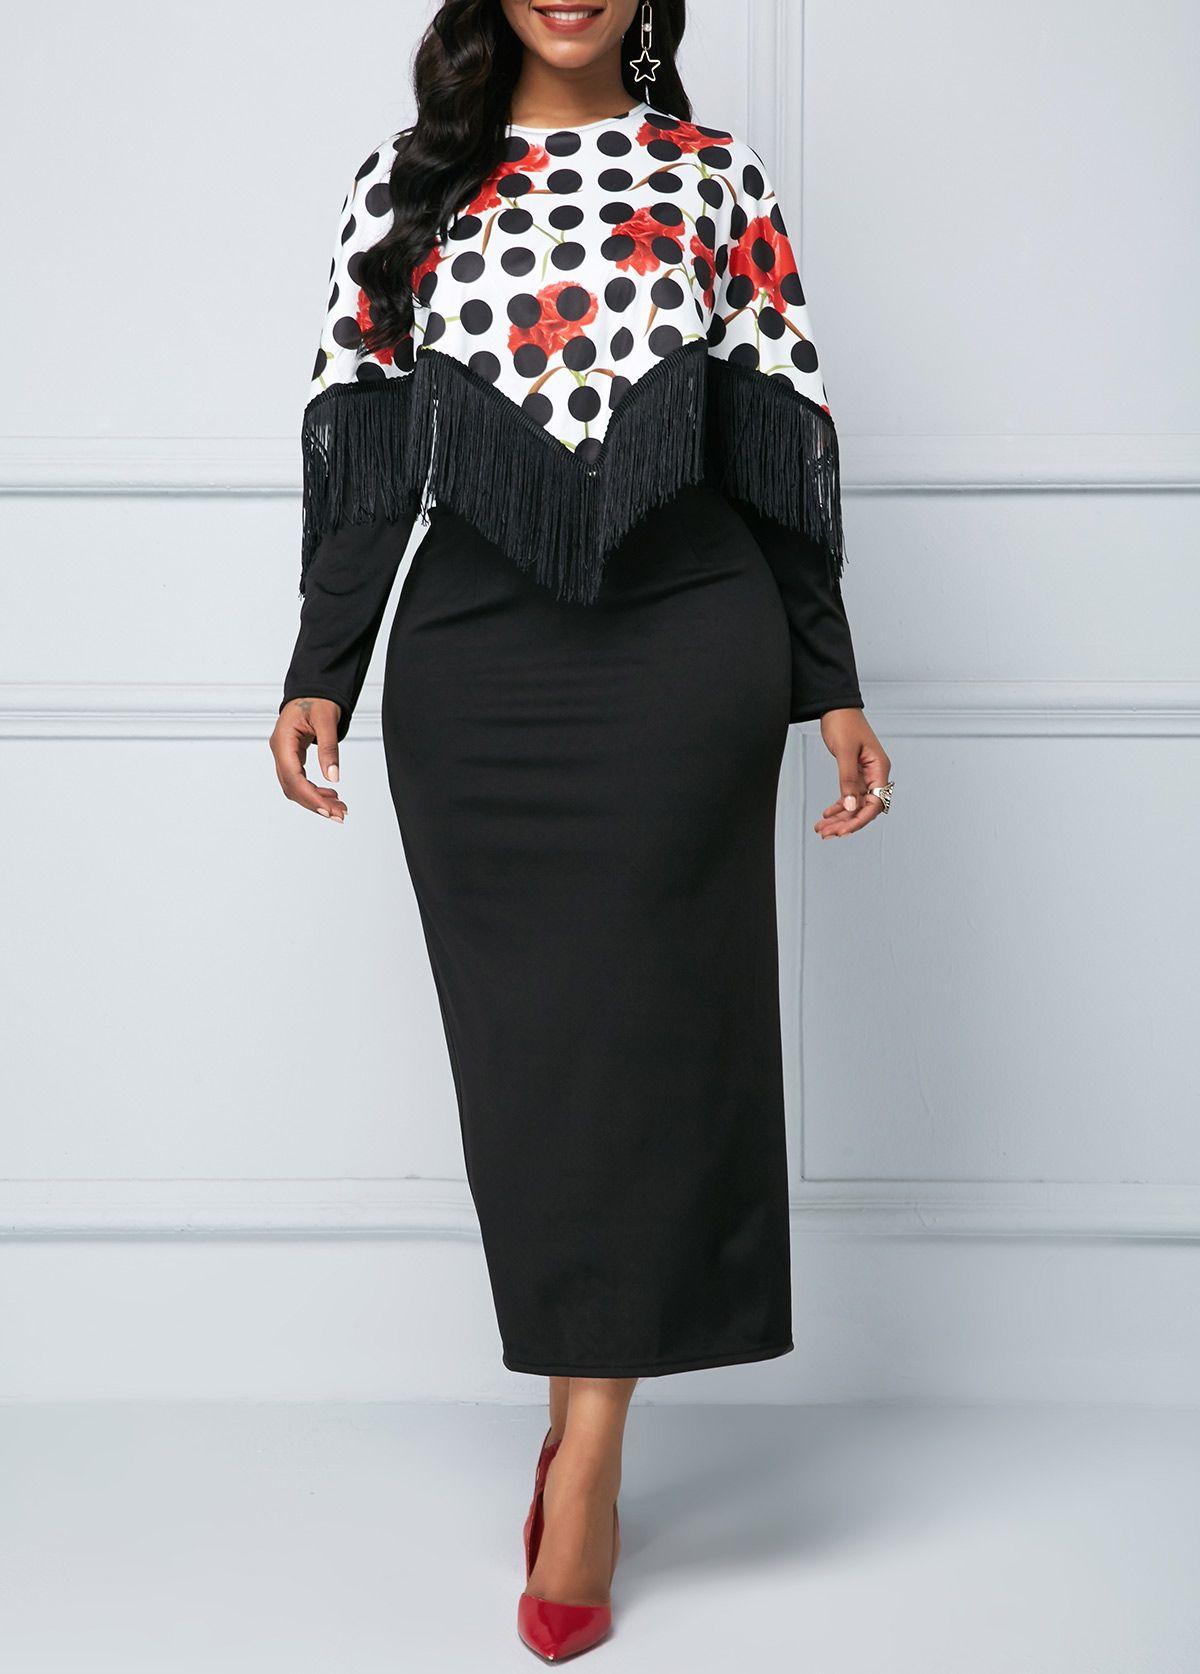 Zipper back long sleeve dot print dress in fall dress